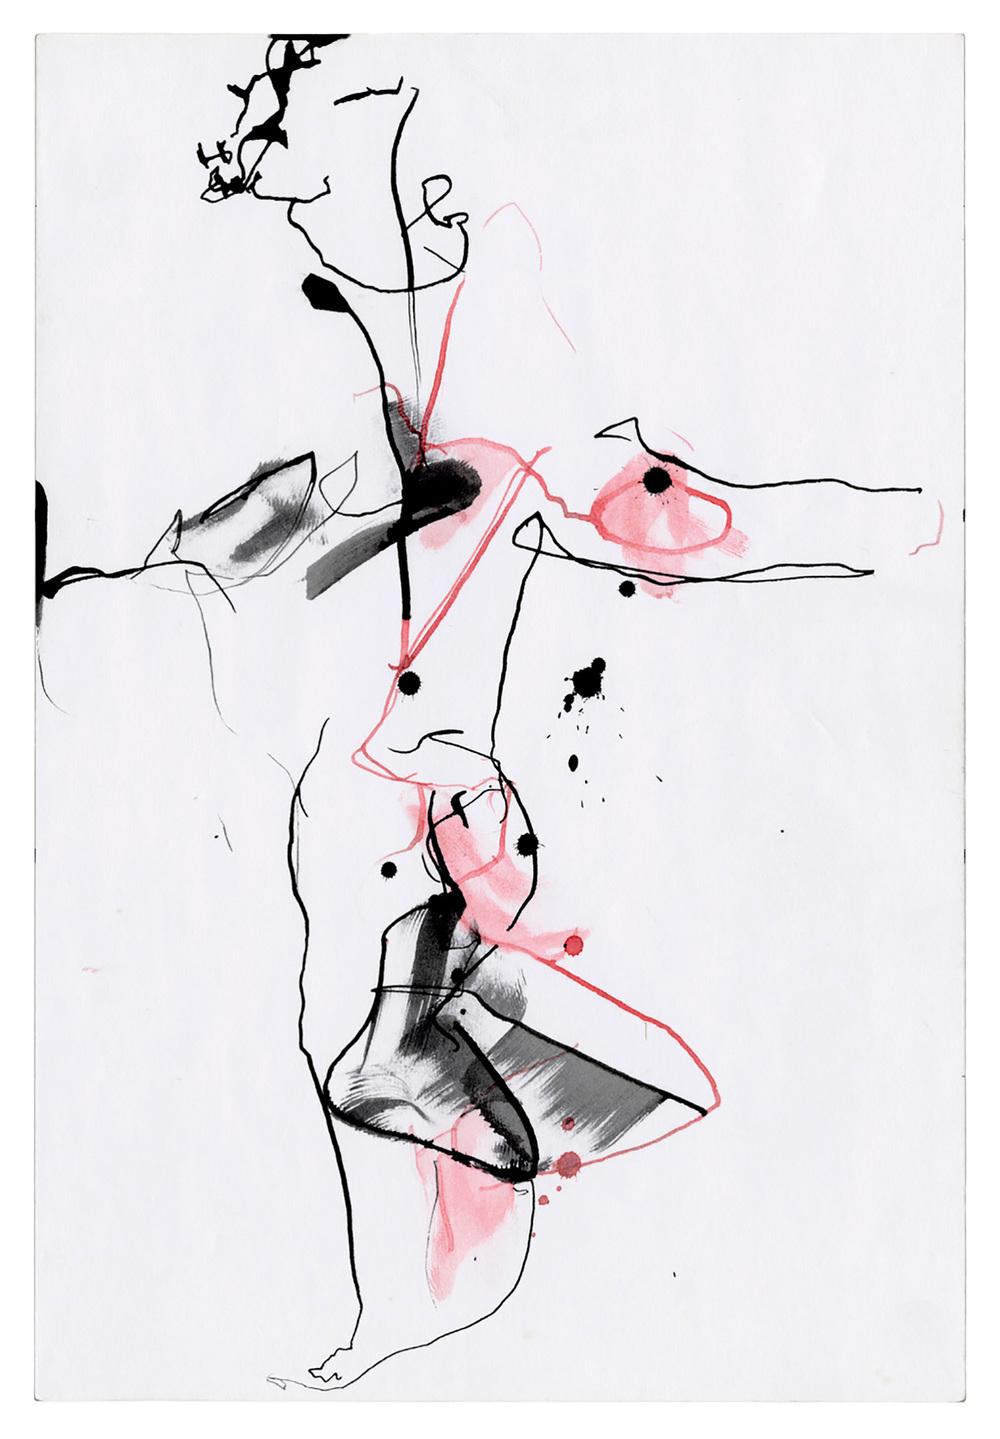 Untitled, 2004